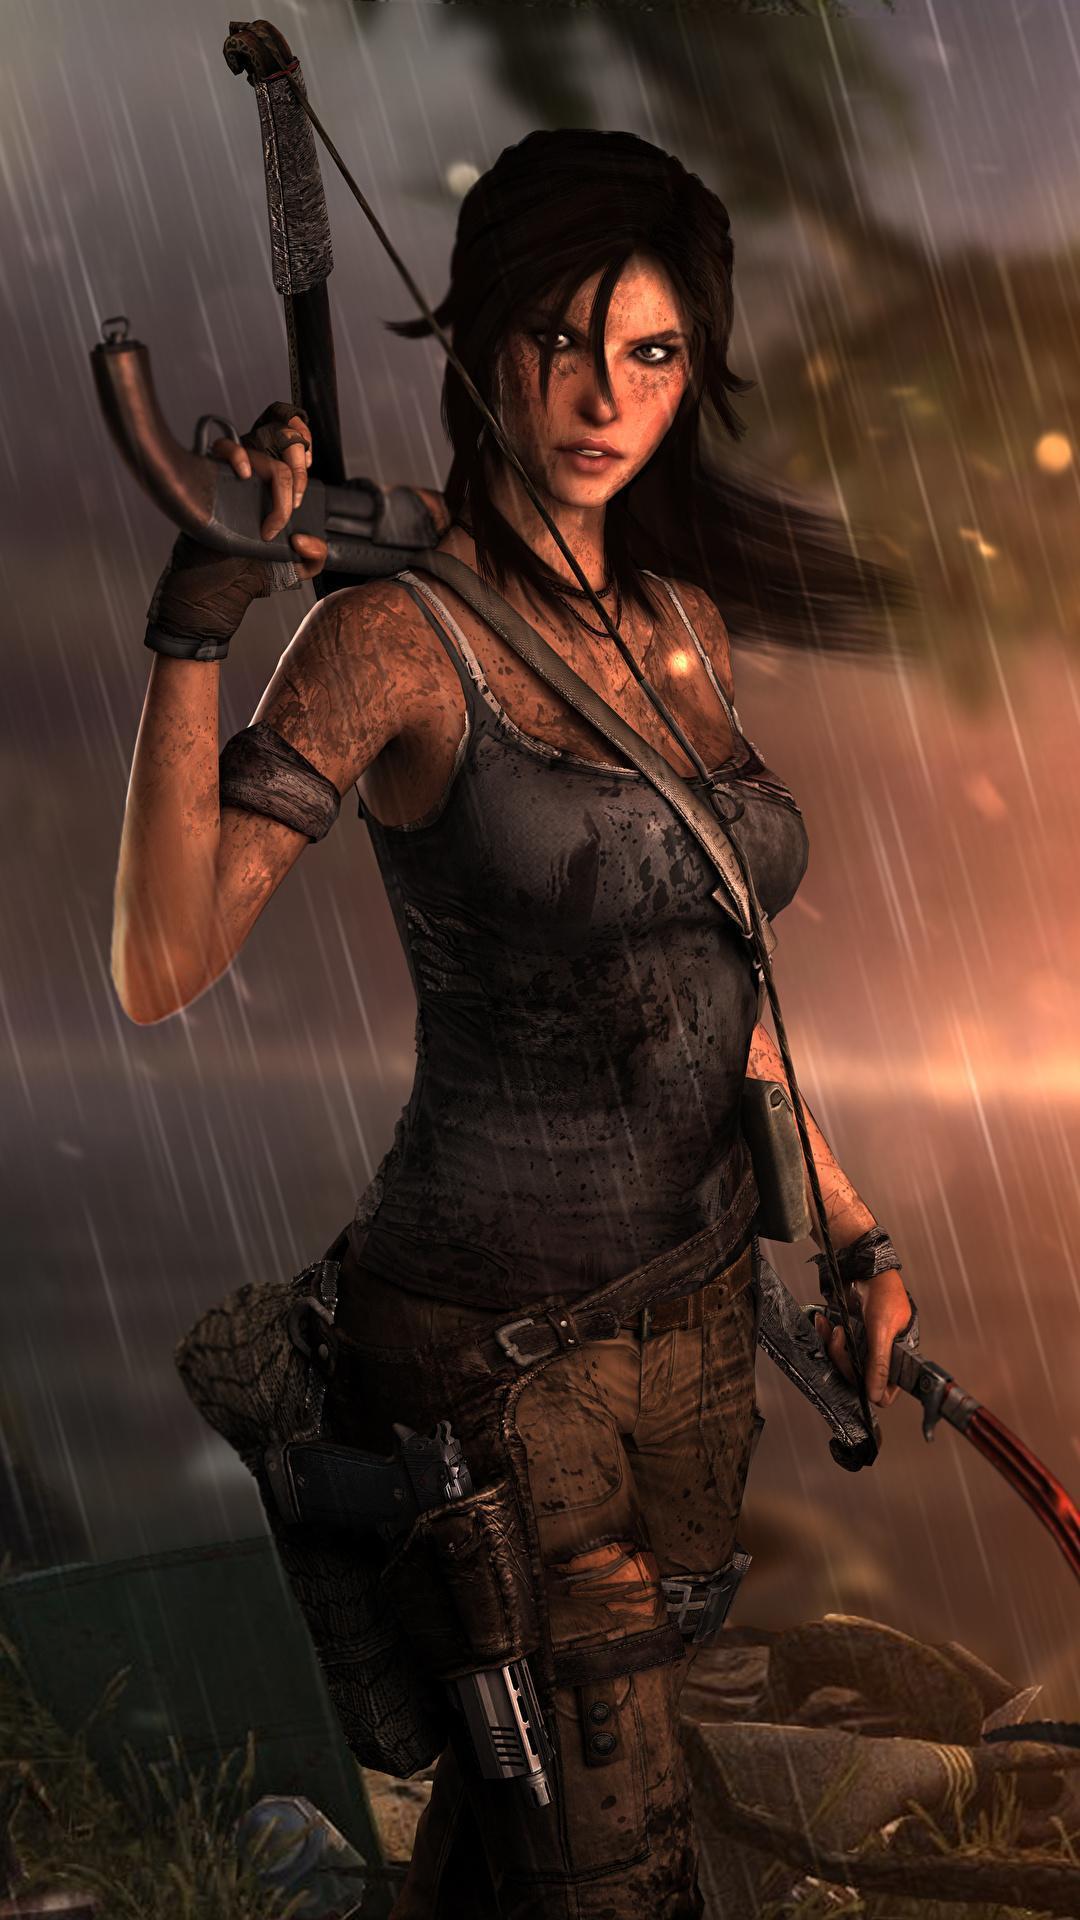 Lara Croft Bilder